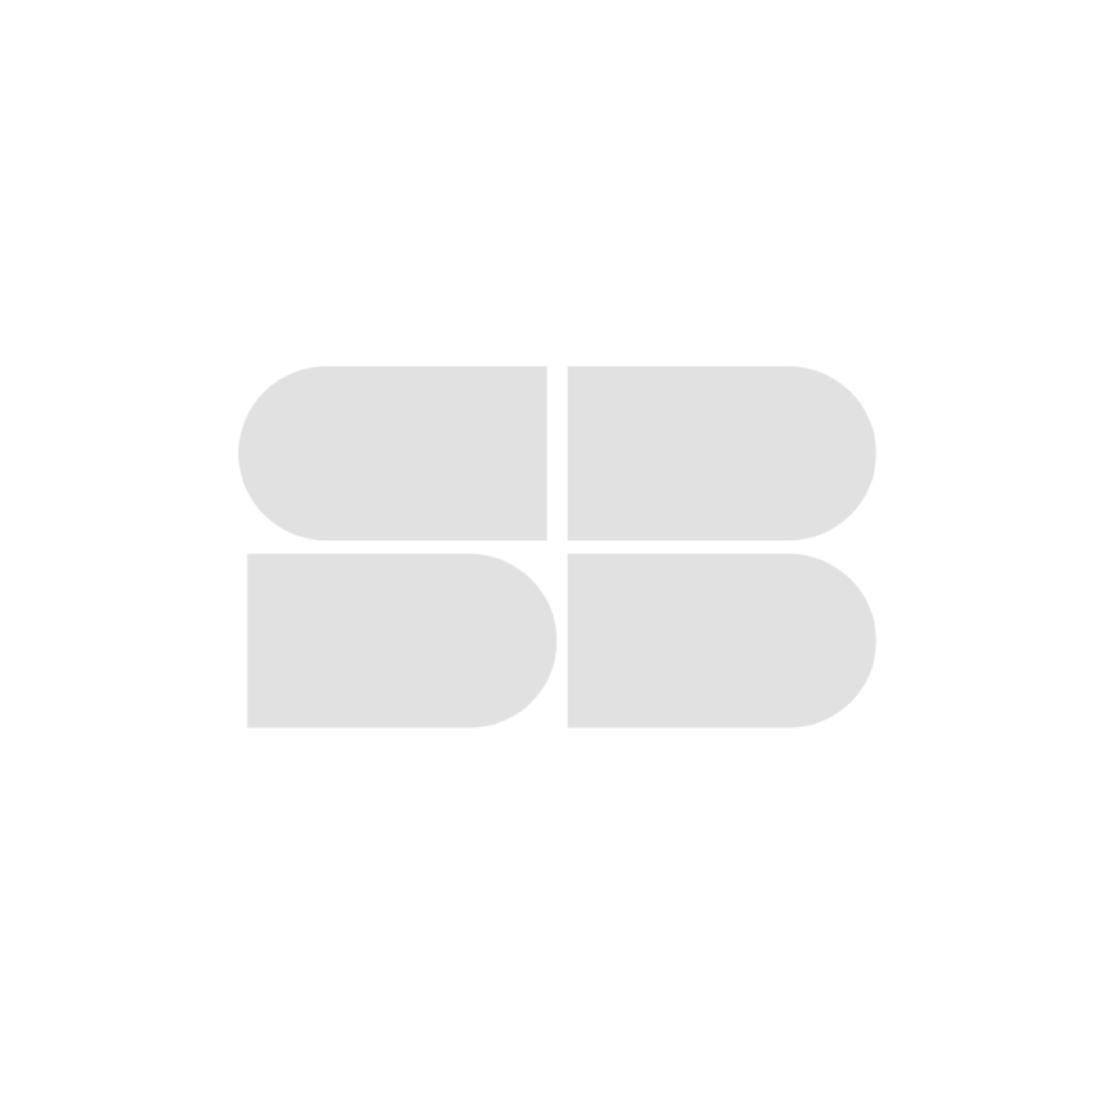 39014030-home-decor-pillows-and-stools-decorative-pillow-01